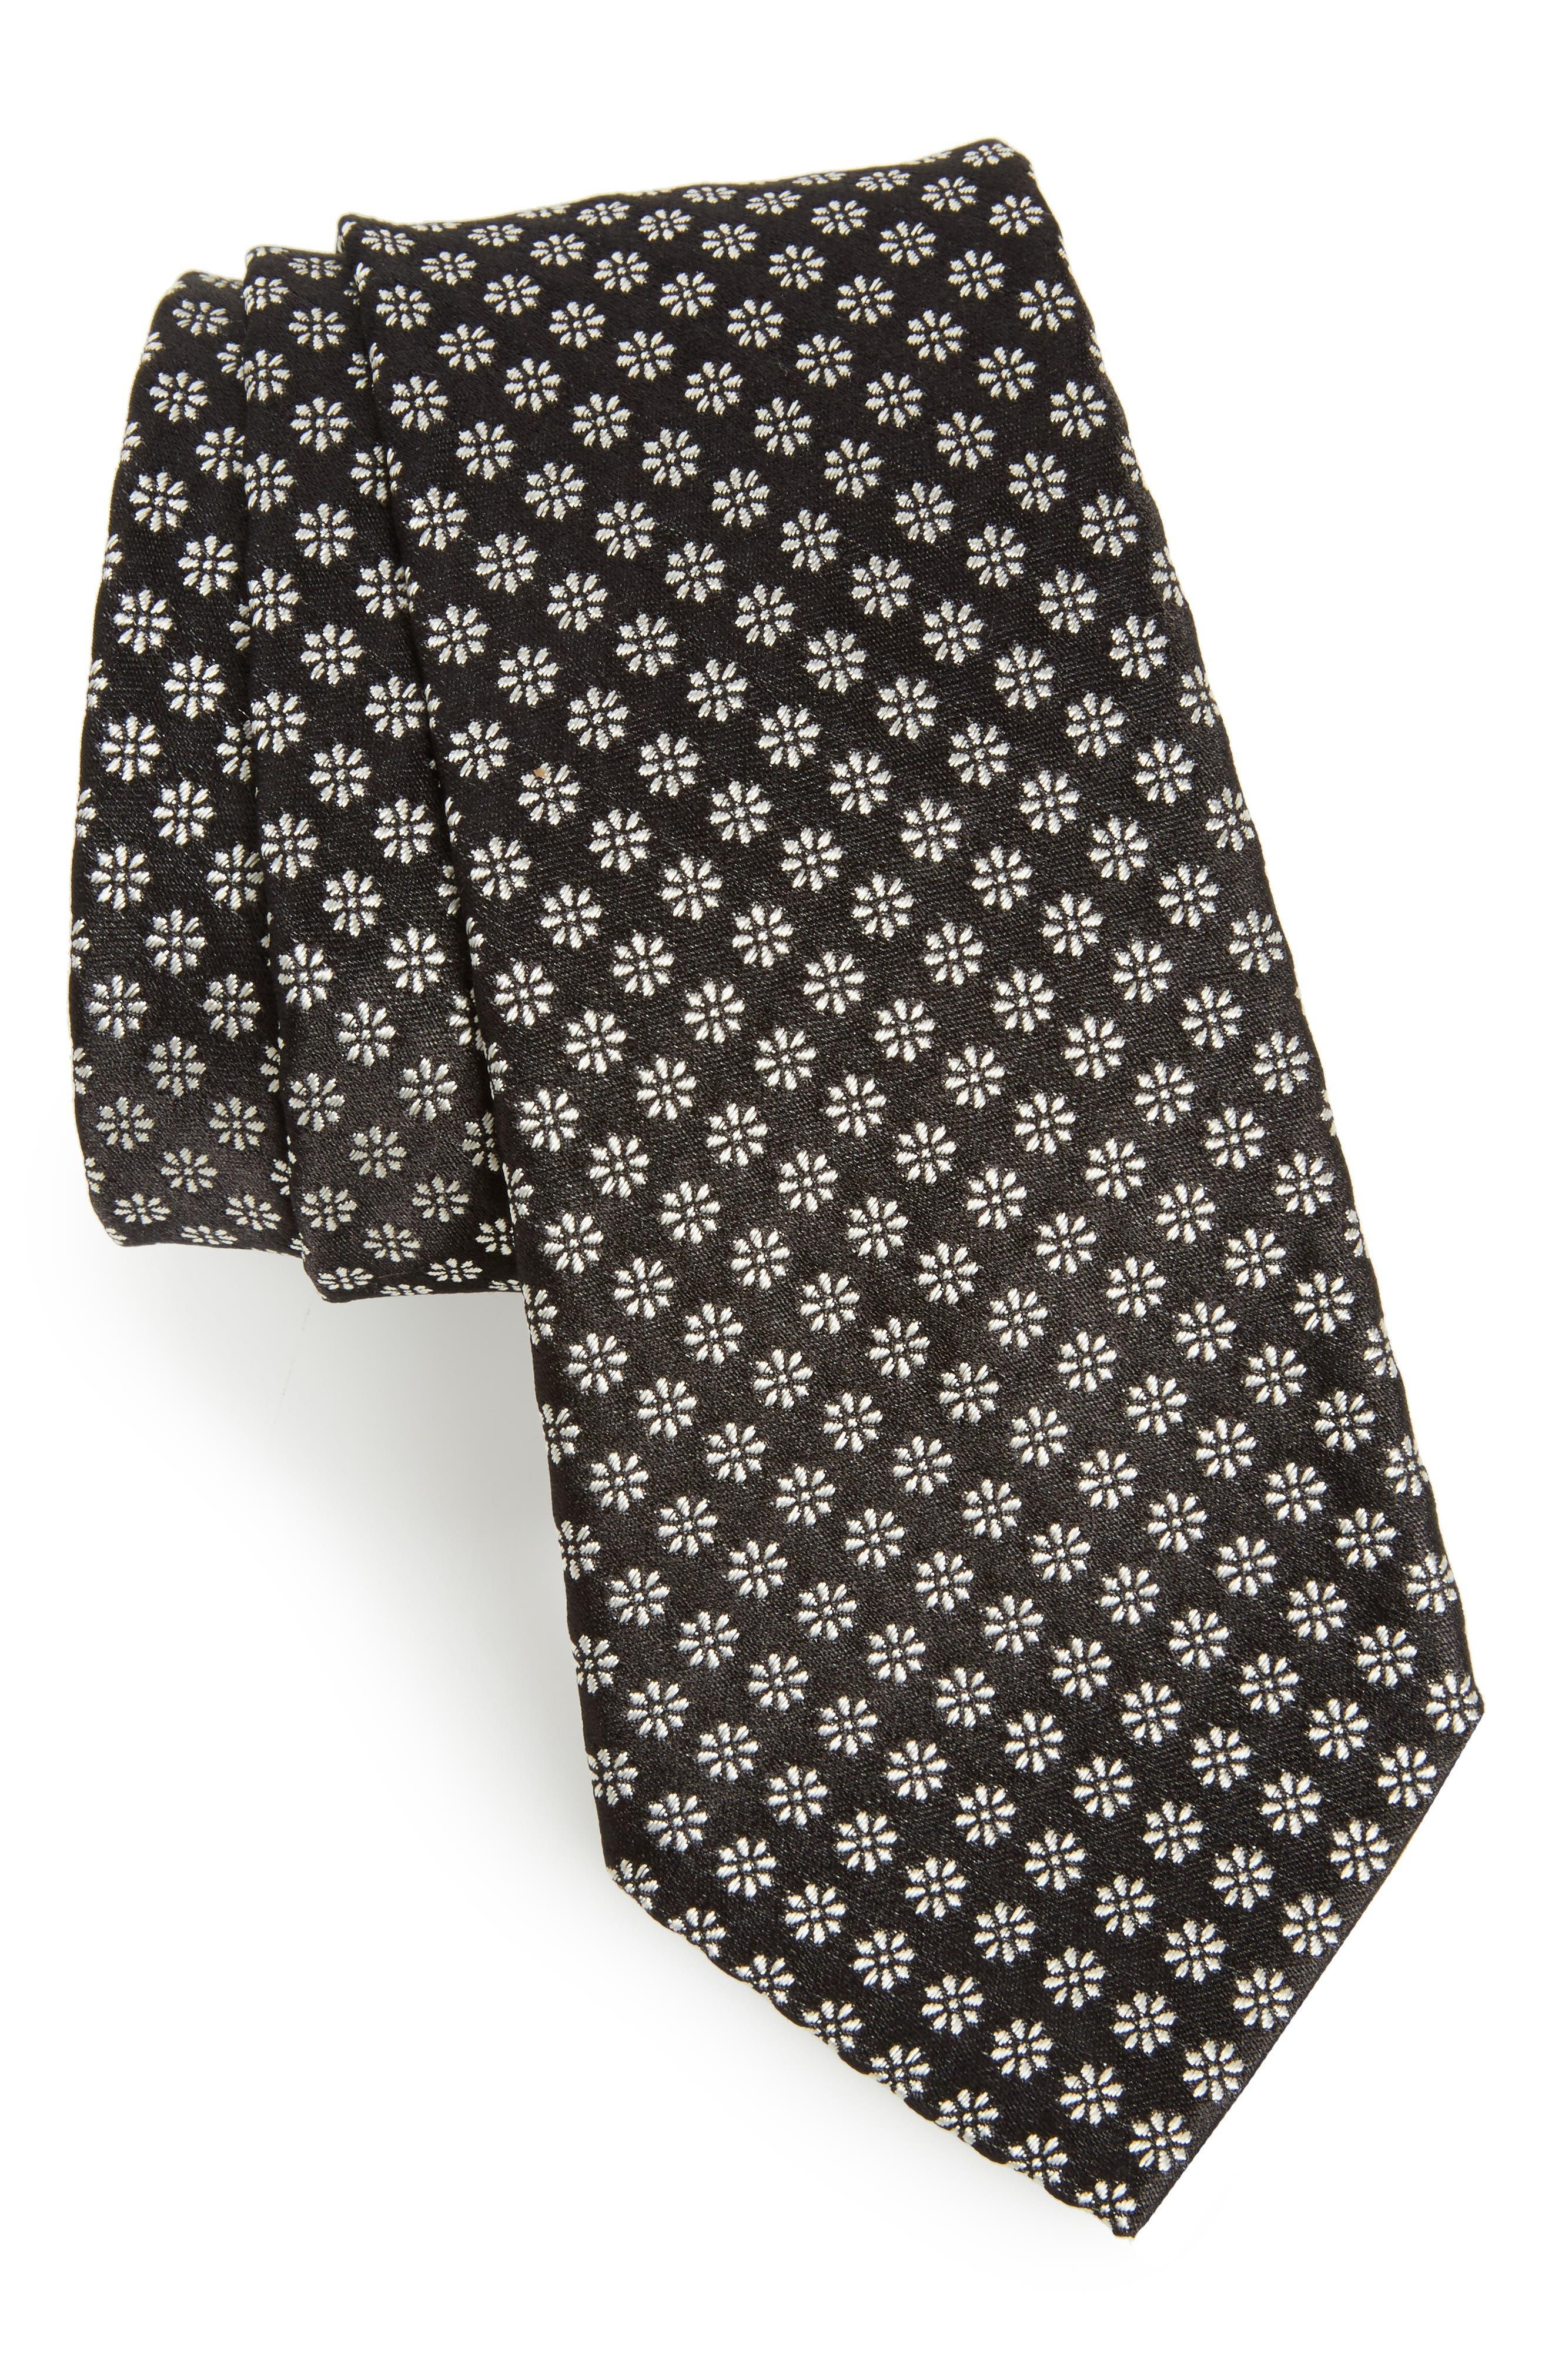 Alternate Image 1 Selected - Paul Smith Floral Print Skinny Tie